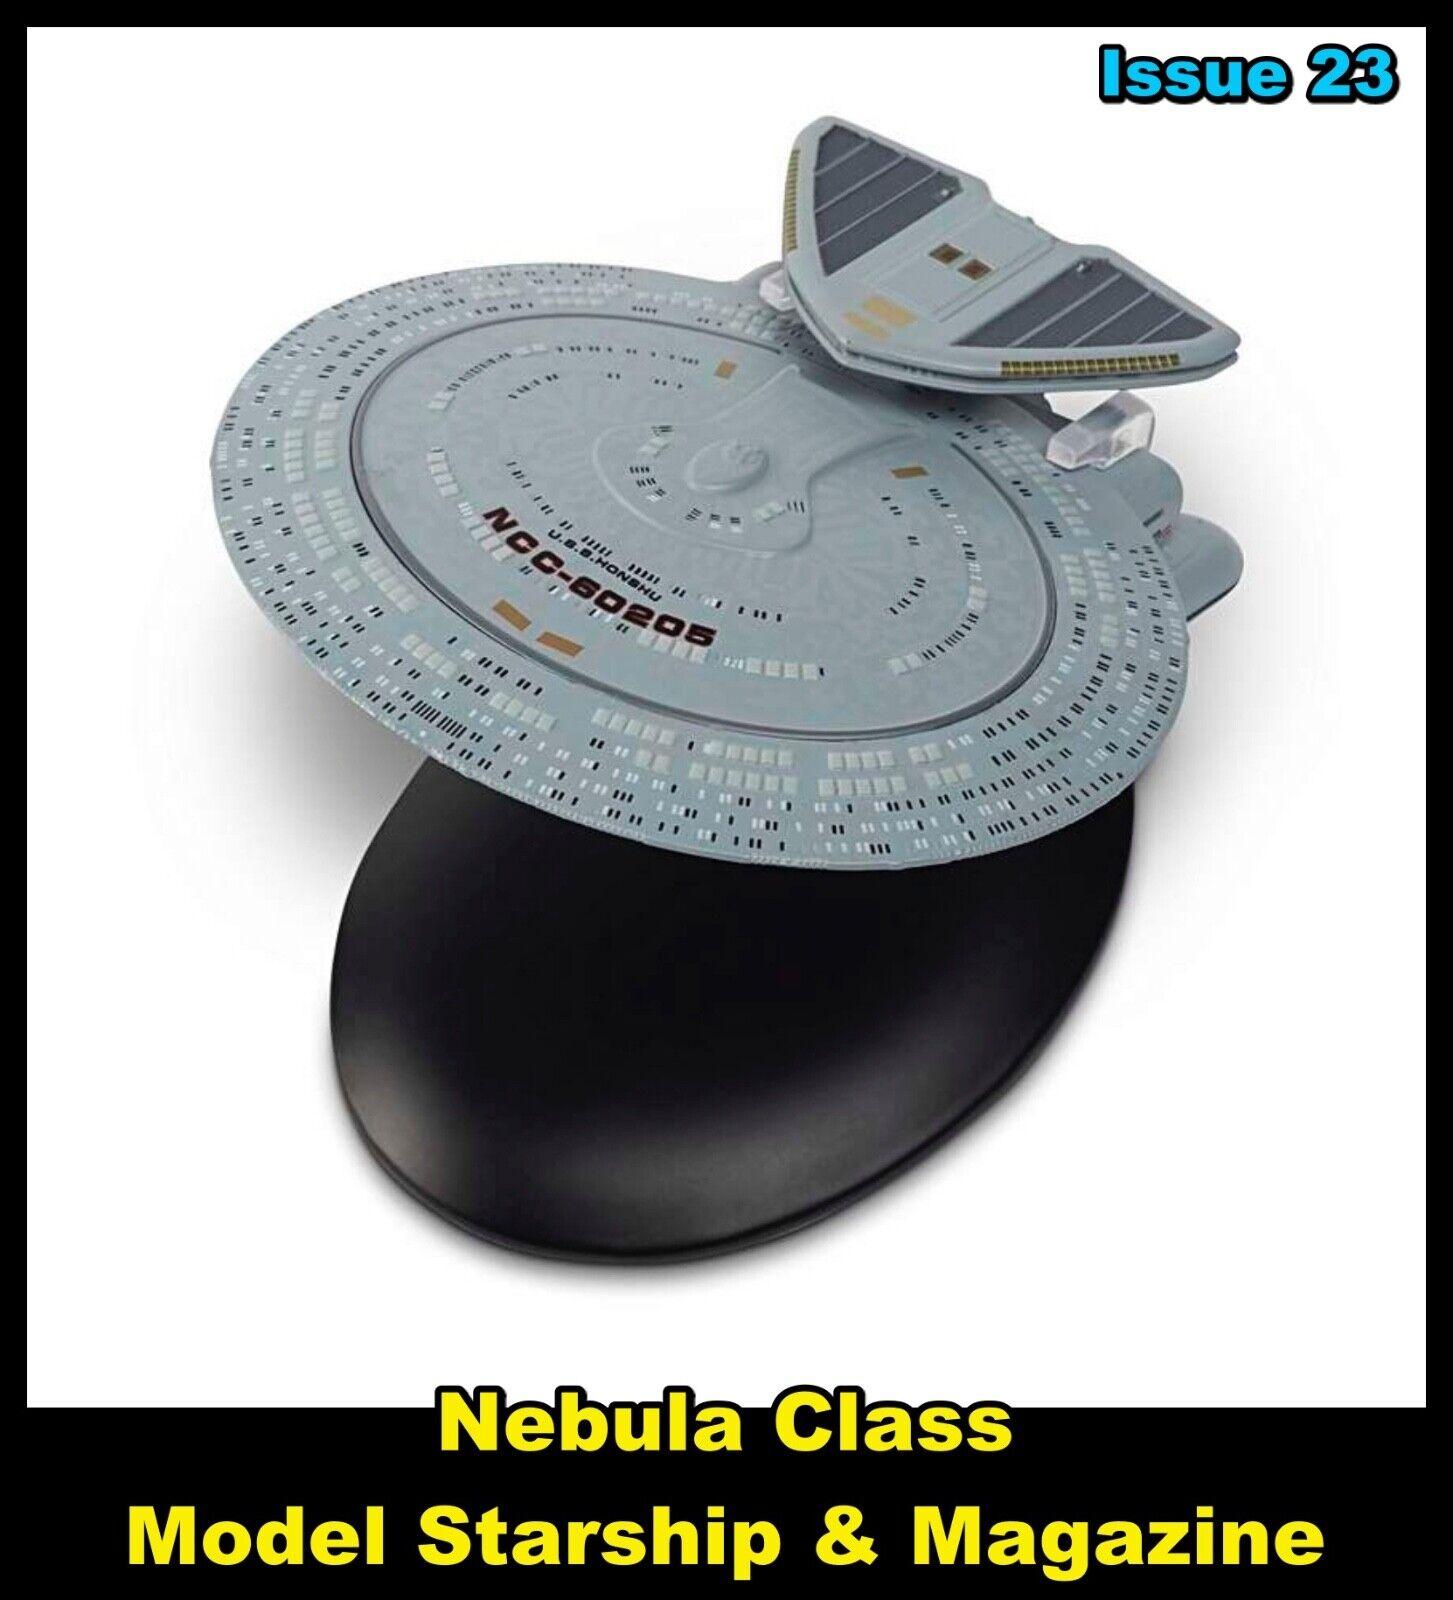 Issue 23: Nebula Class Starship Model